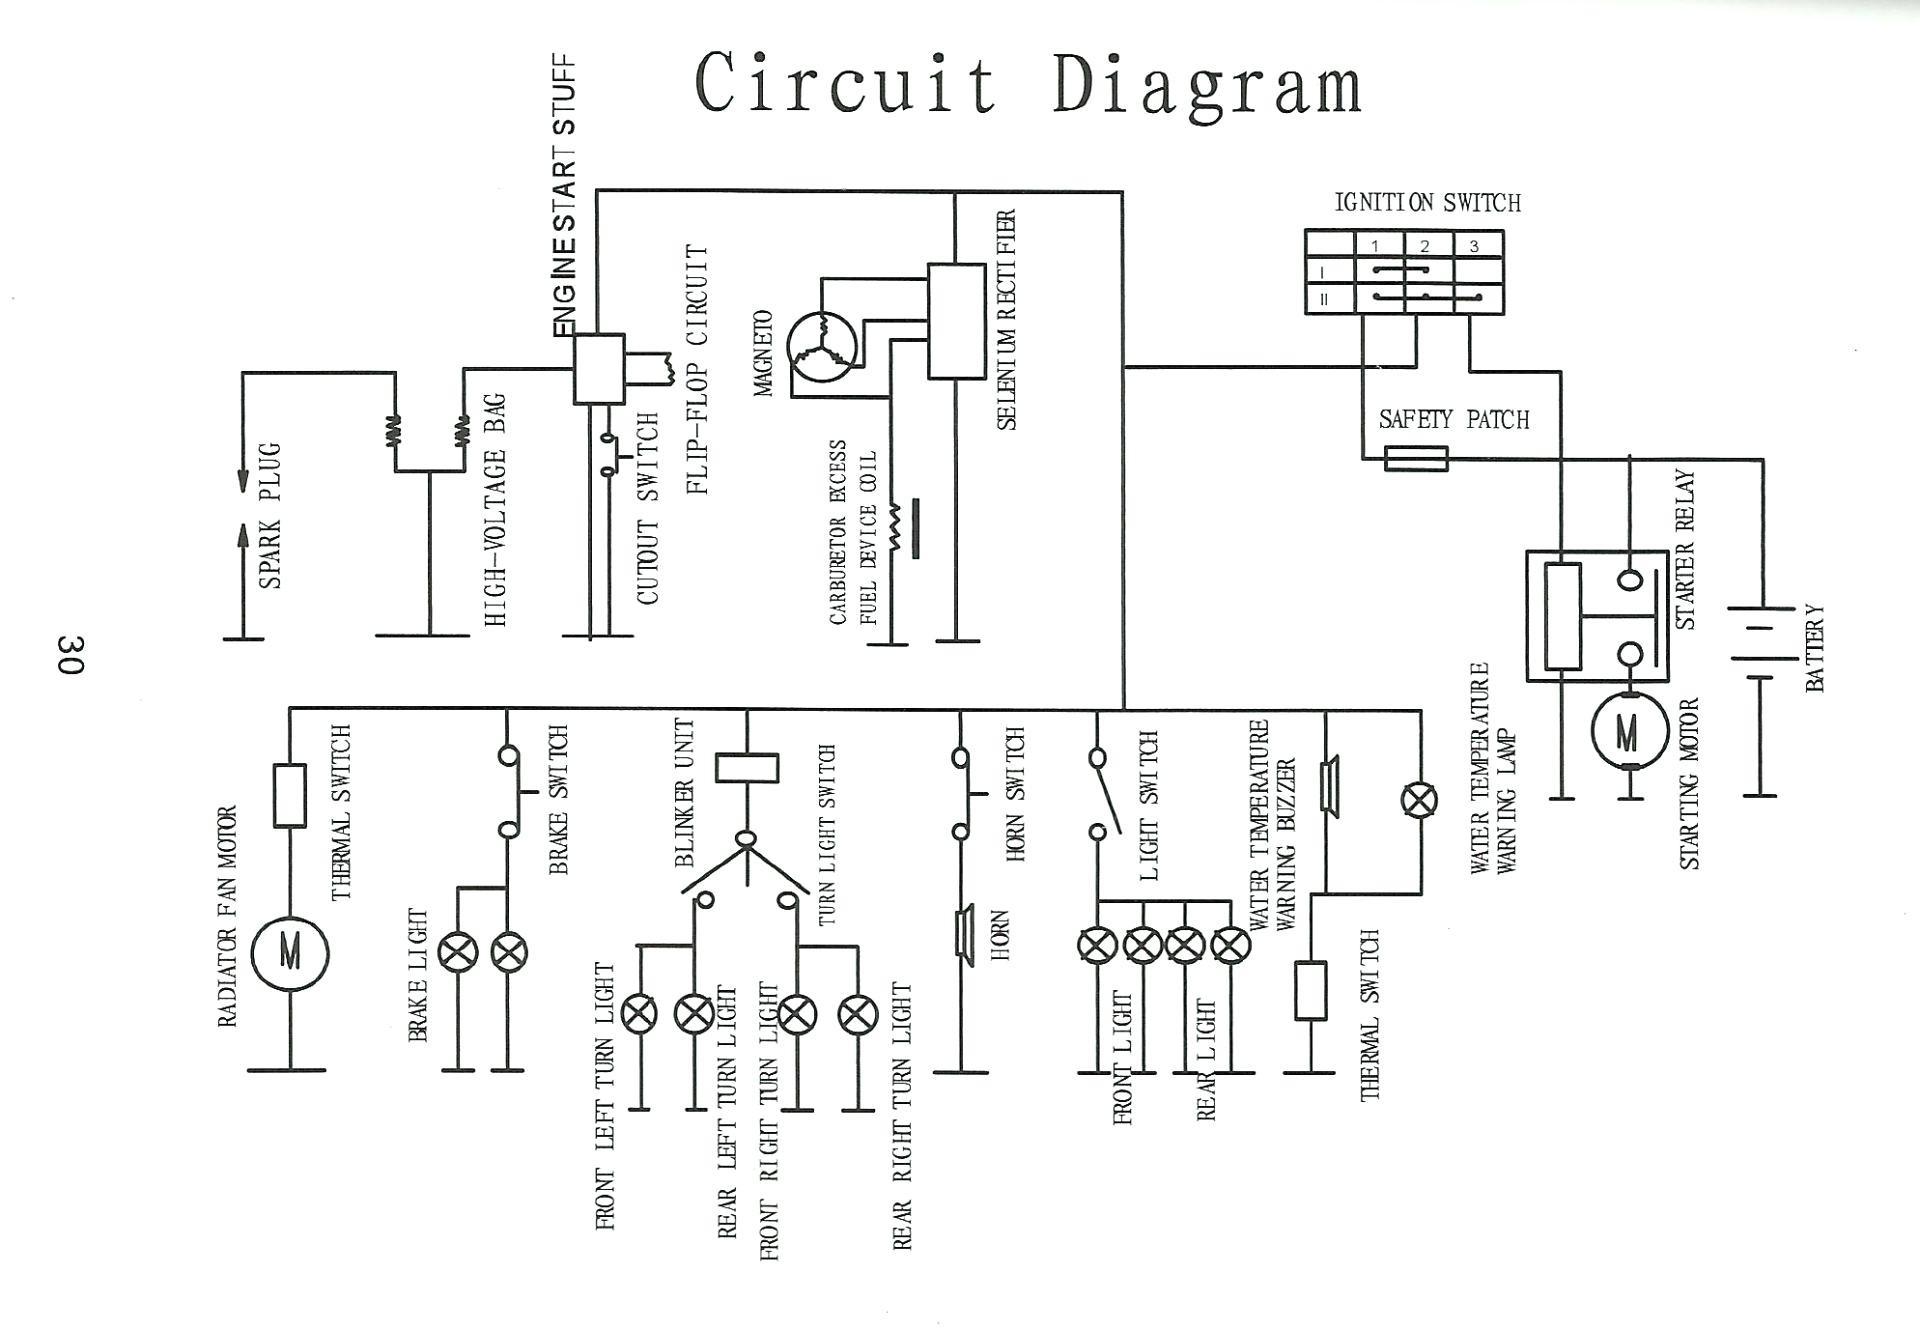 Go Kart Wiring Diagrams | Wiring Diagram Hammerhead Cc Go Kart Wiring Diagram on